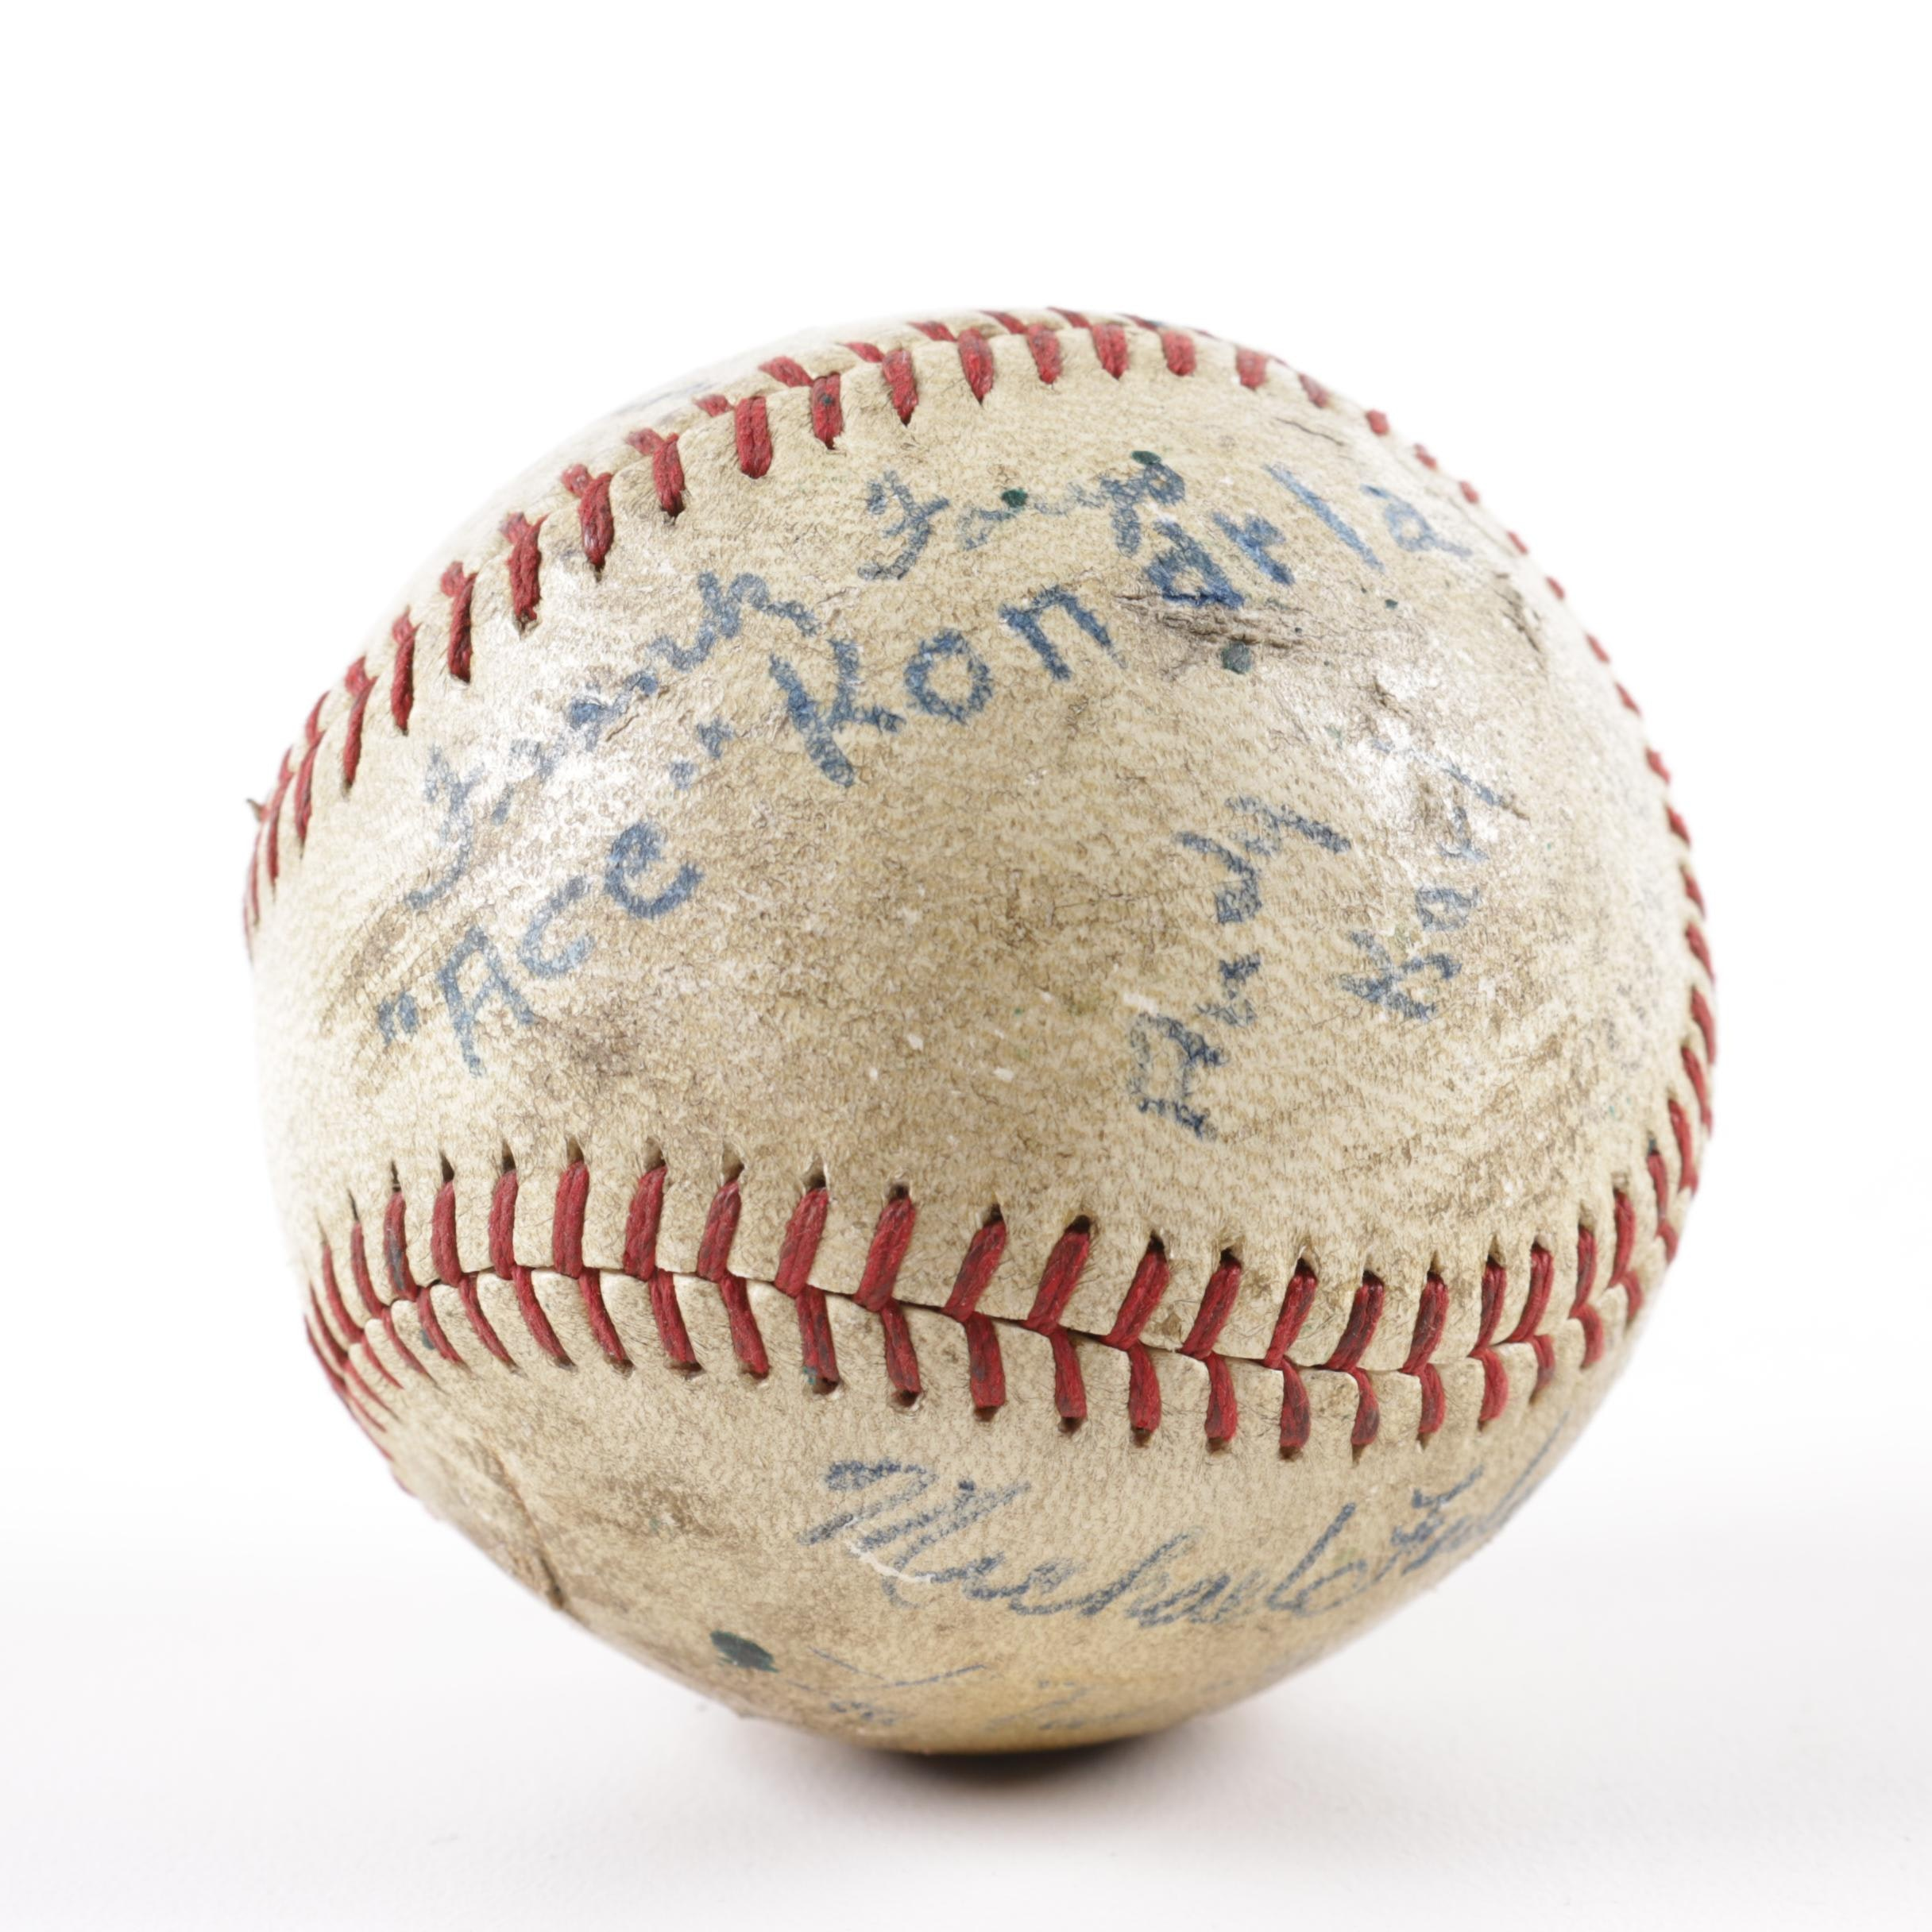 Youth Baseball Team Autographed Baseball